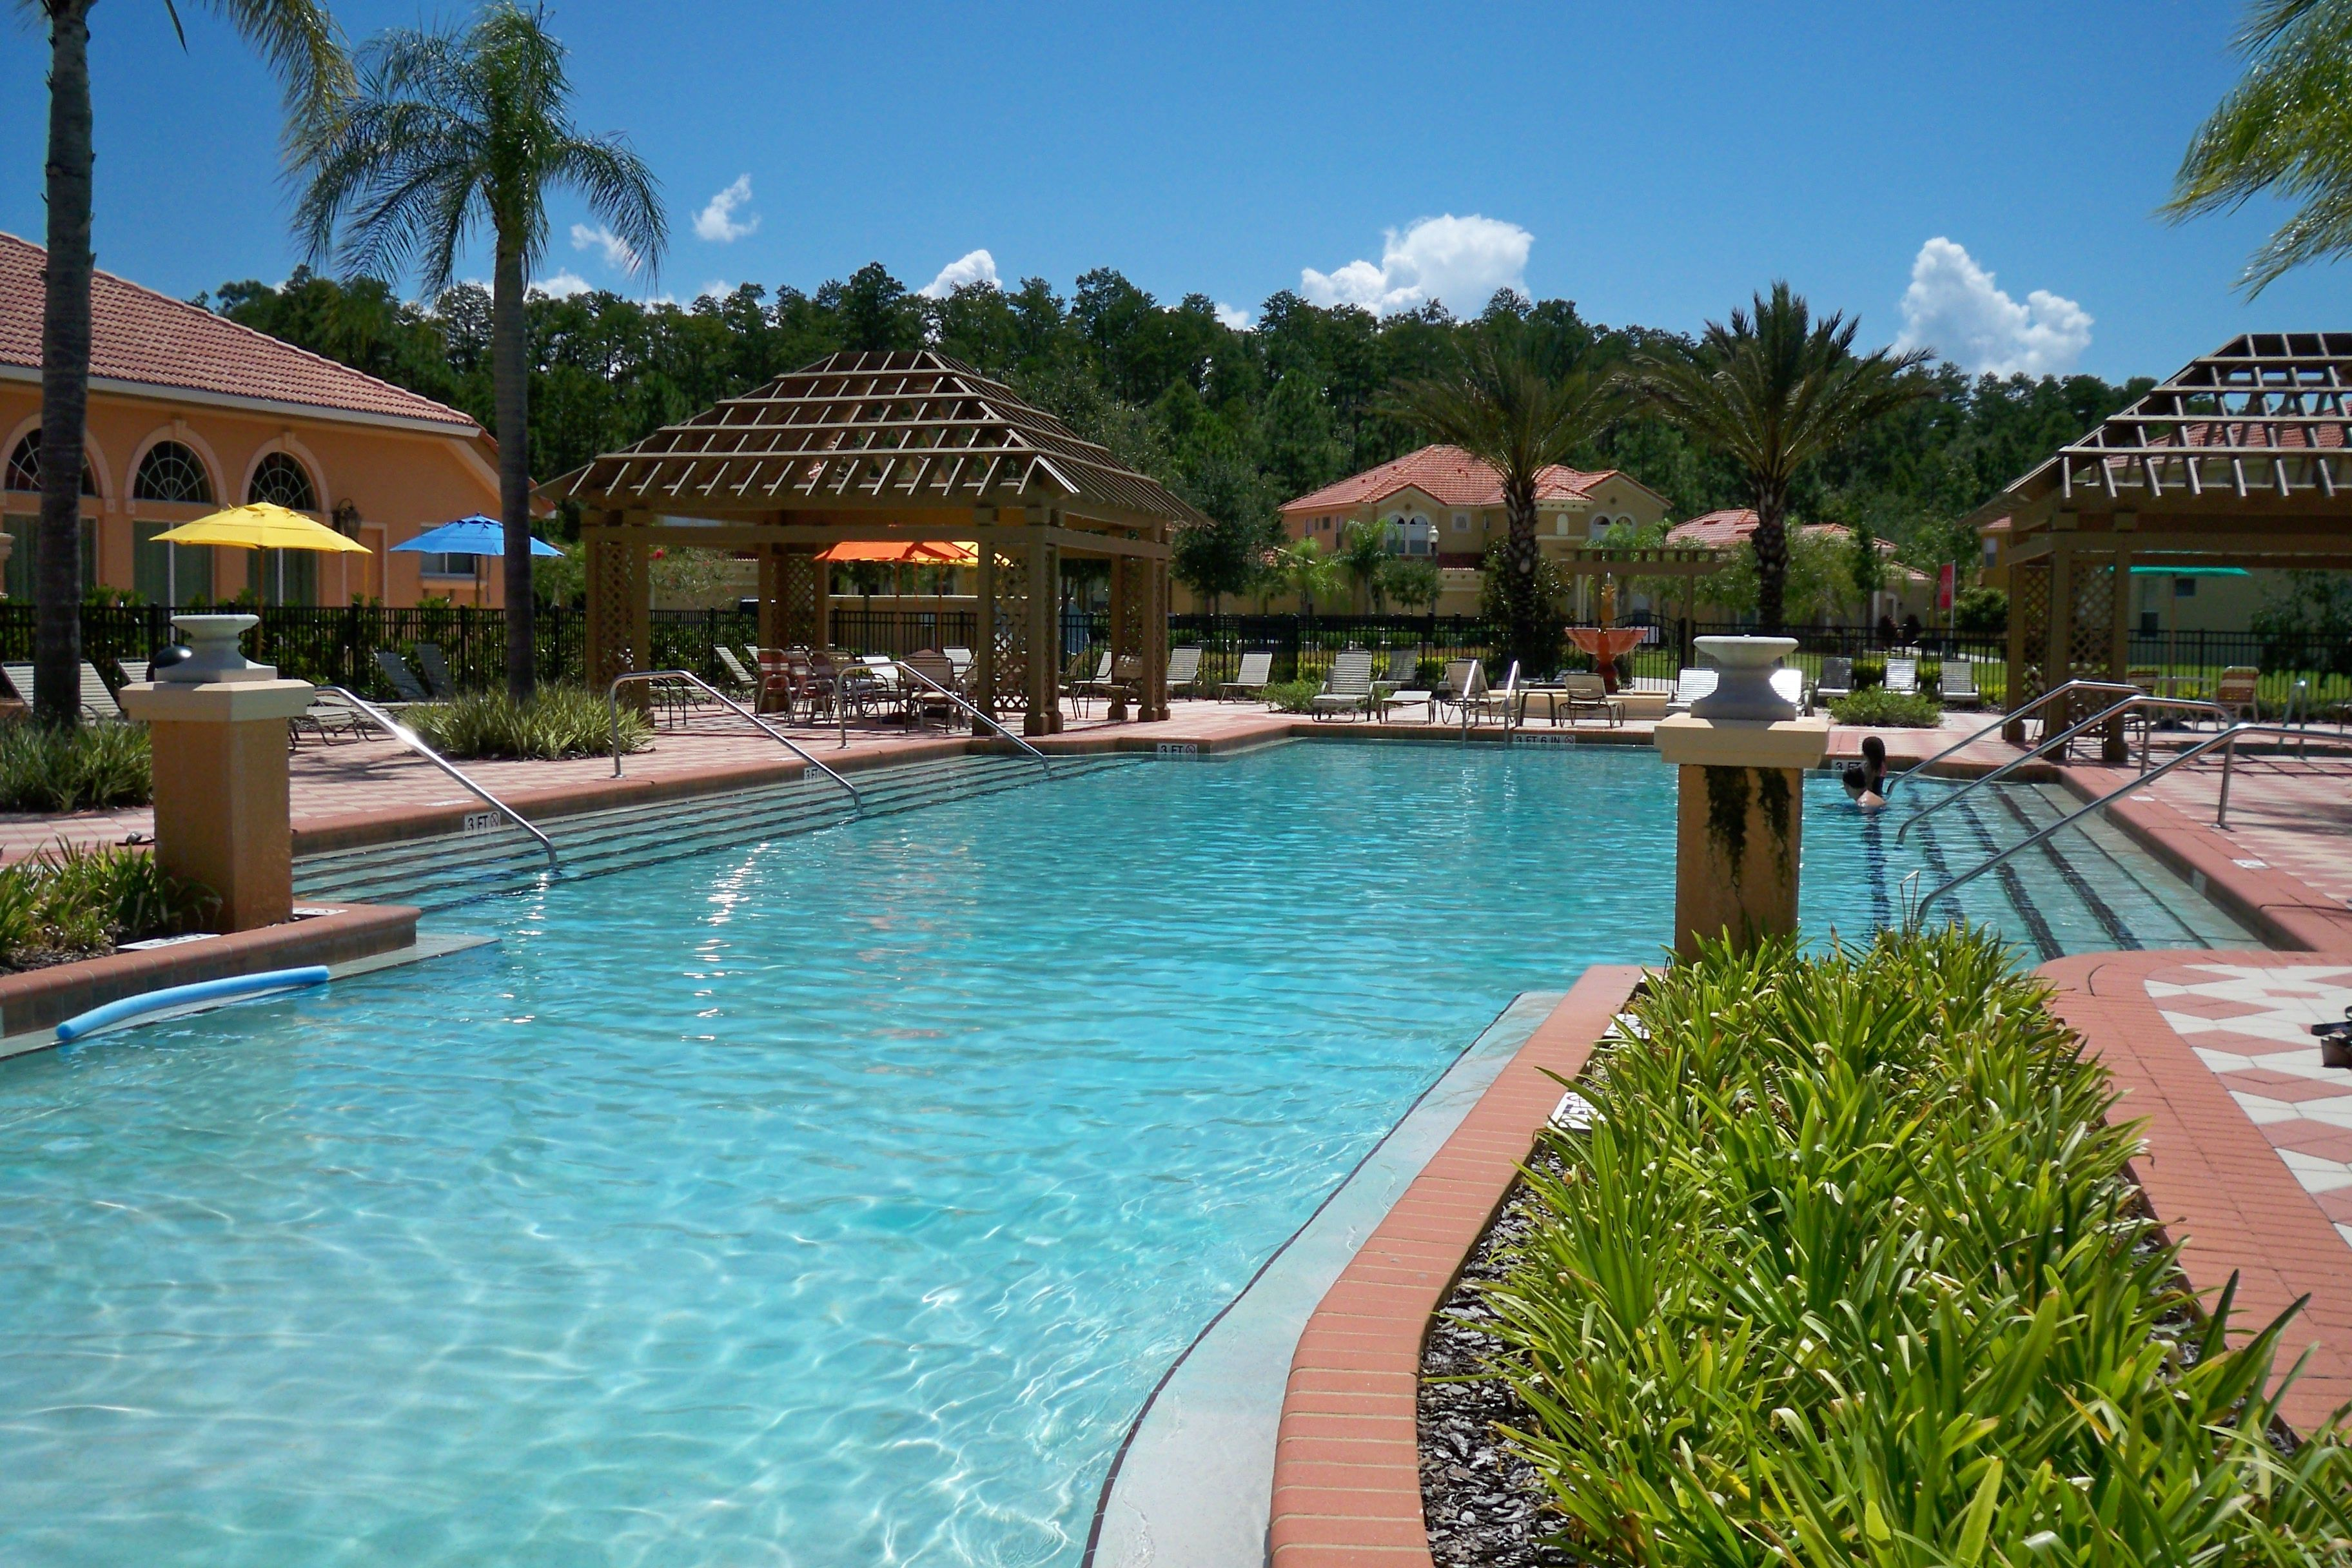 Bella vida clubhouse pool vacationrental bellavida